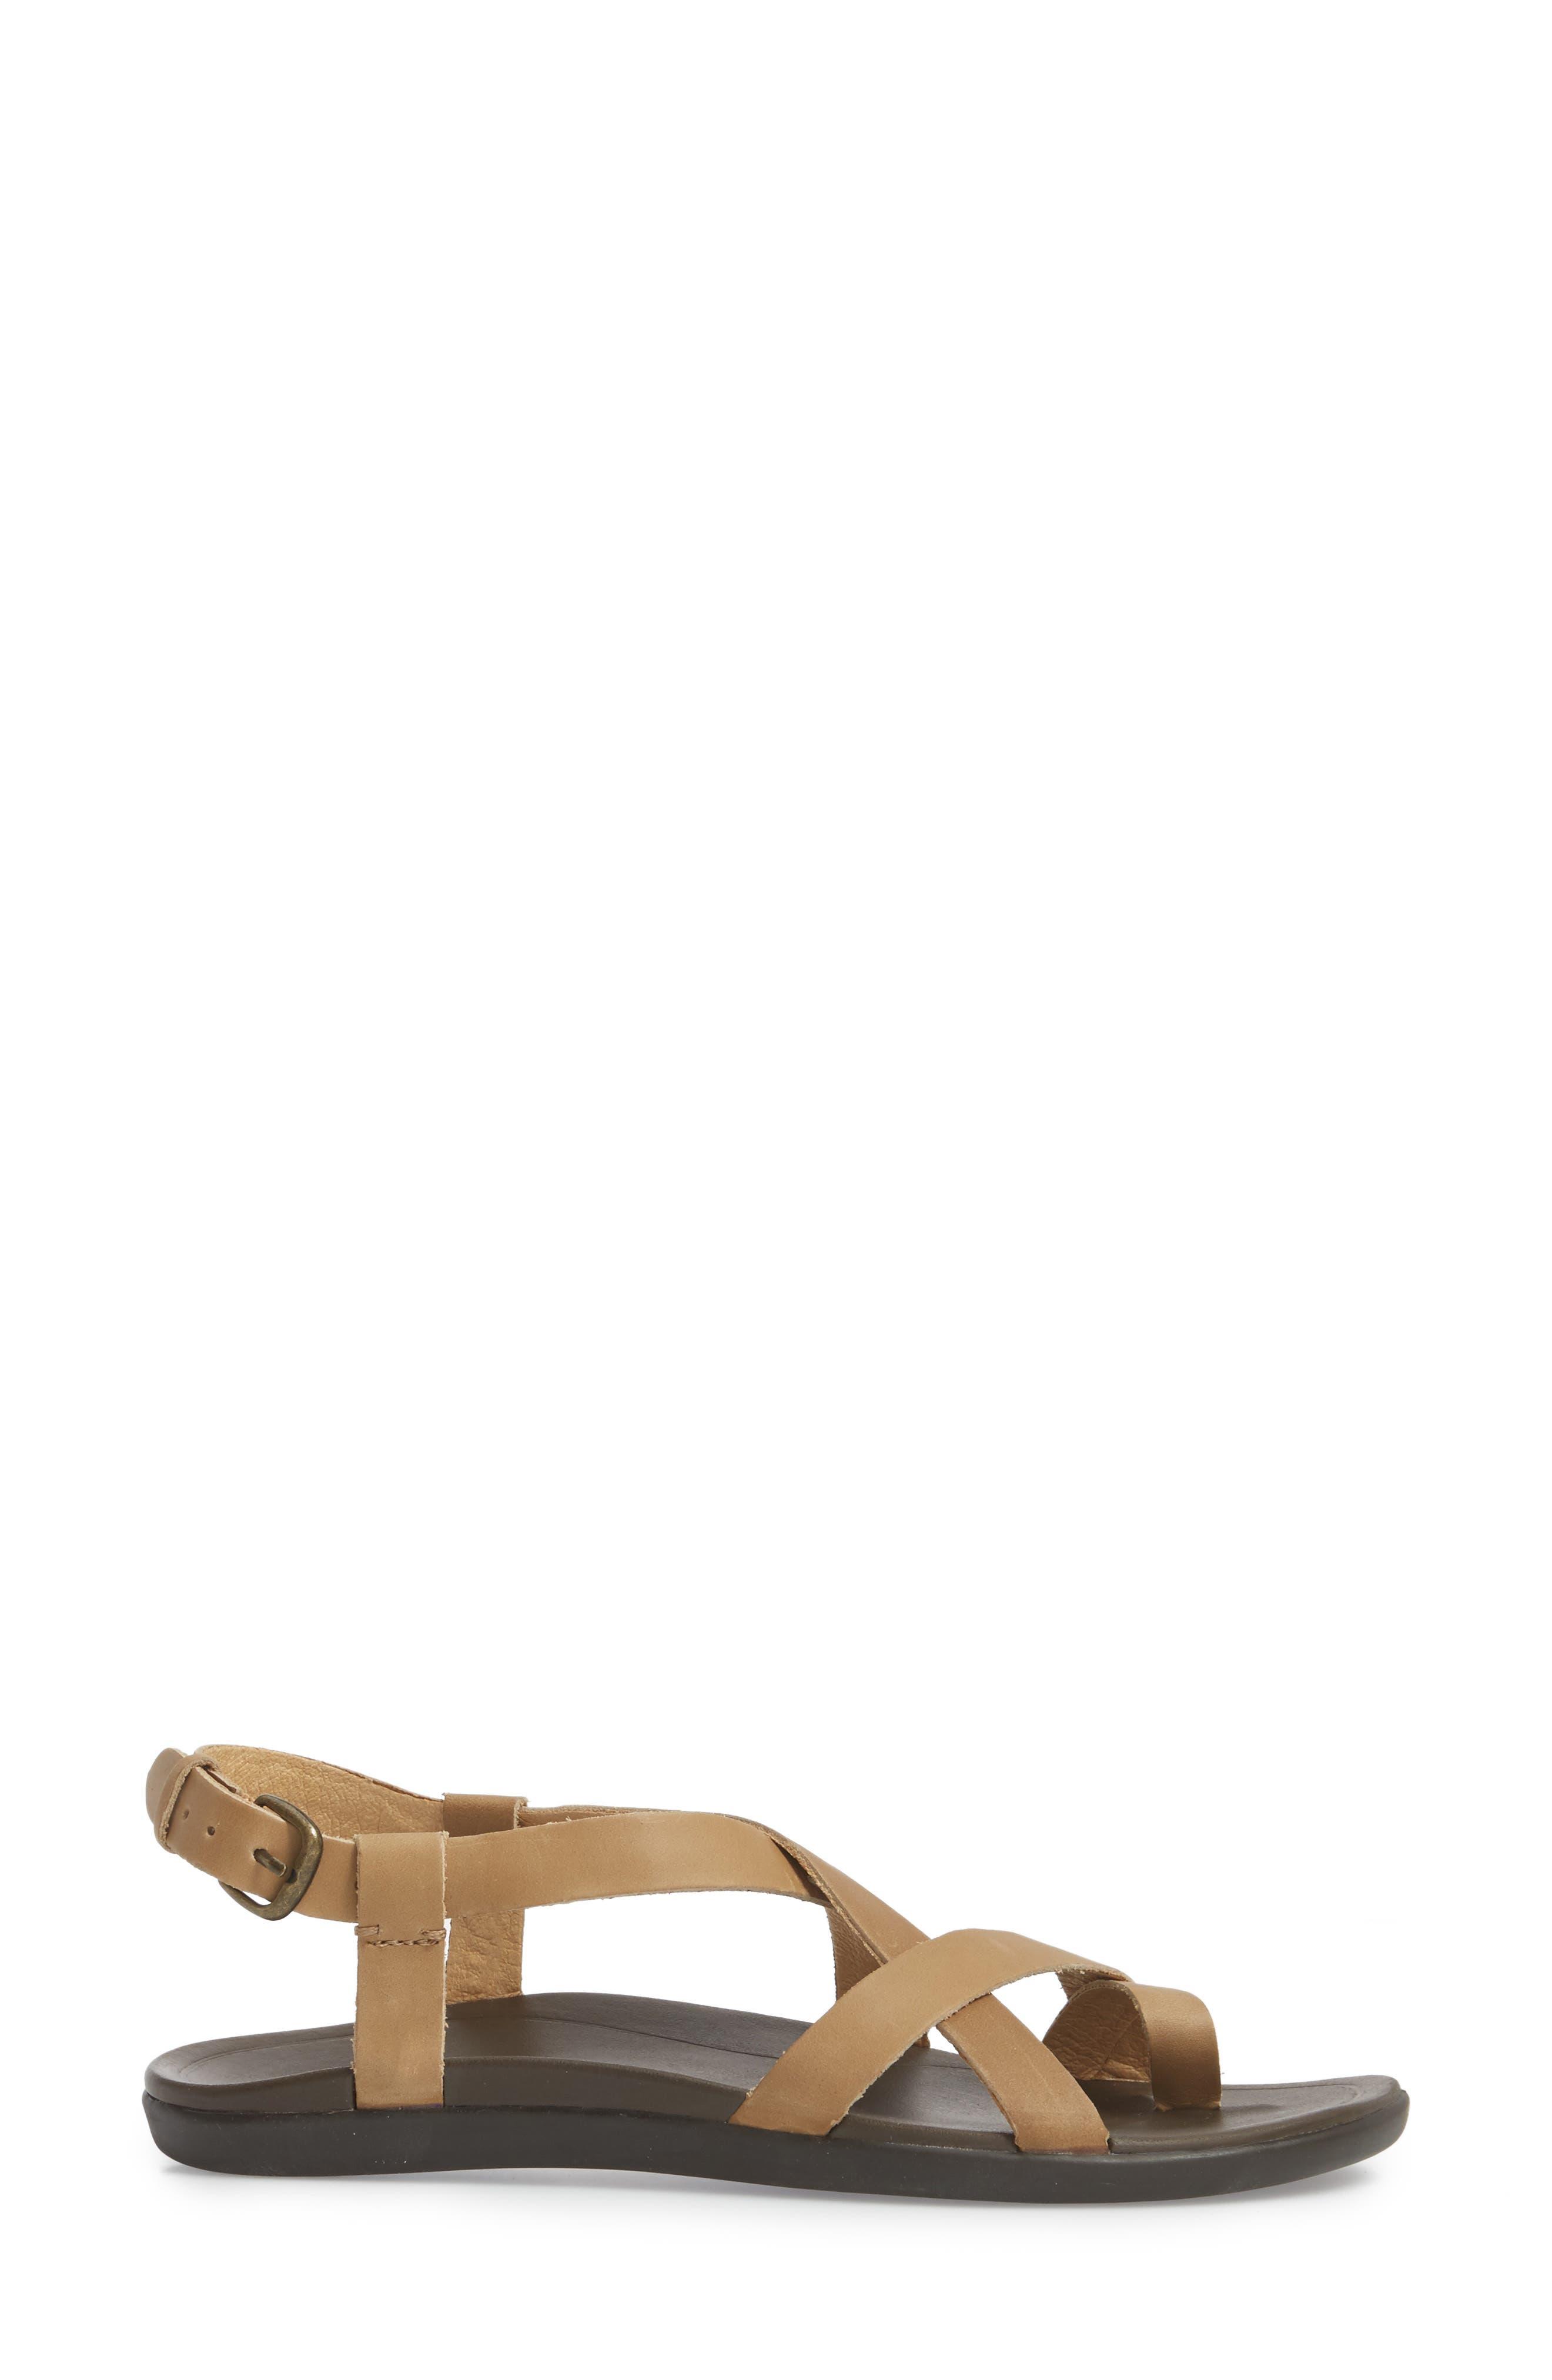 'Upena' Flat Sandal,                             Alternate thumbnail 3, color,                             GOLDEN SAND/ SAND LEATHER